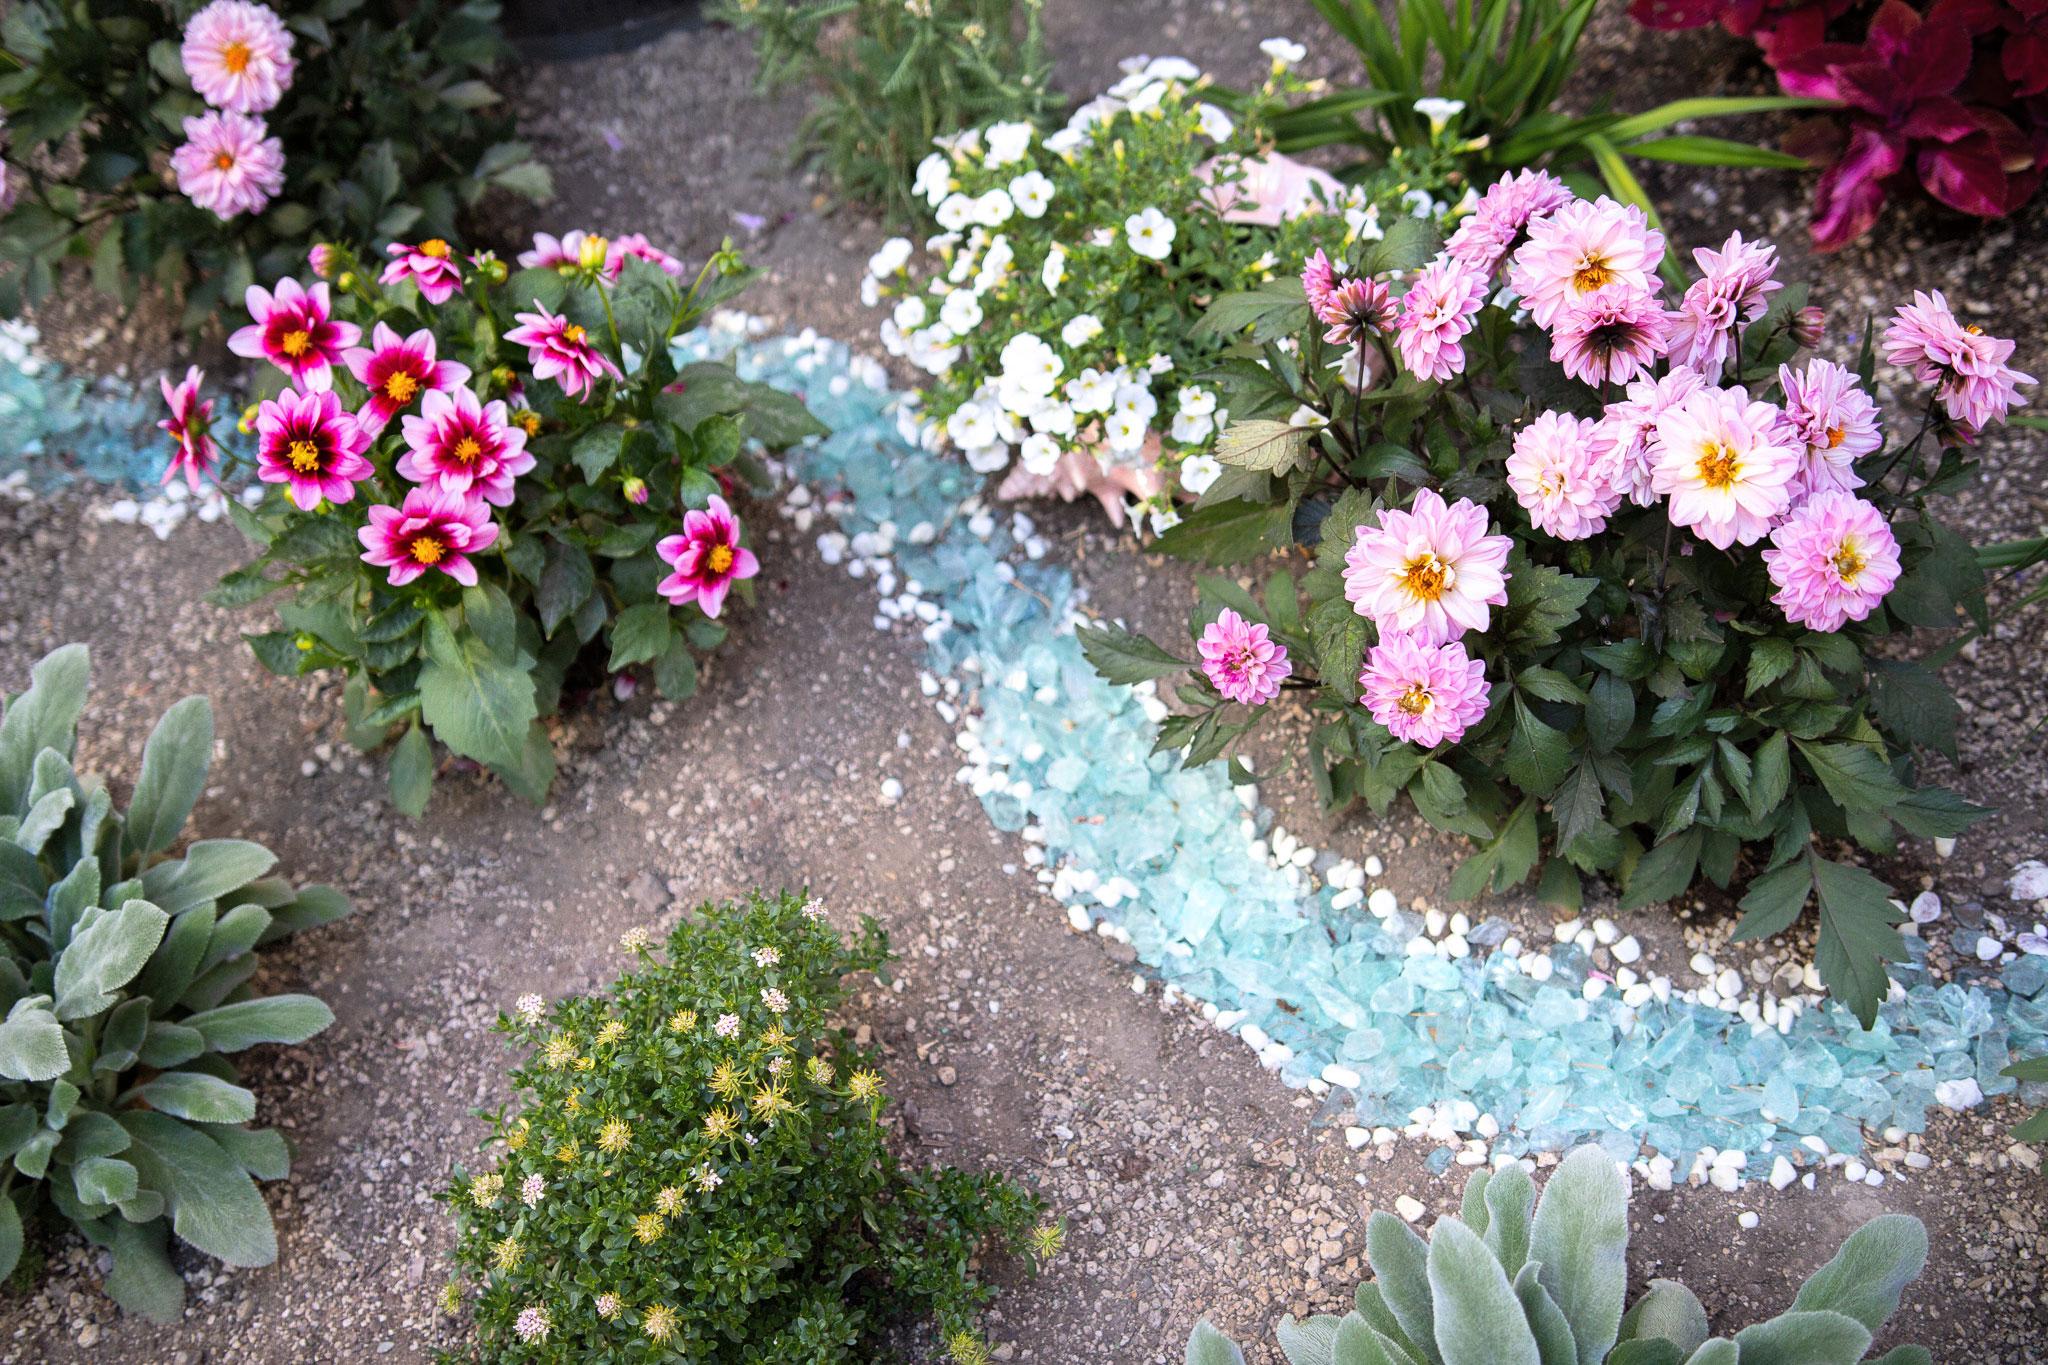 Adelya_Tumasyeva_the-garden-project_6.jpg